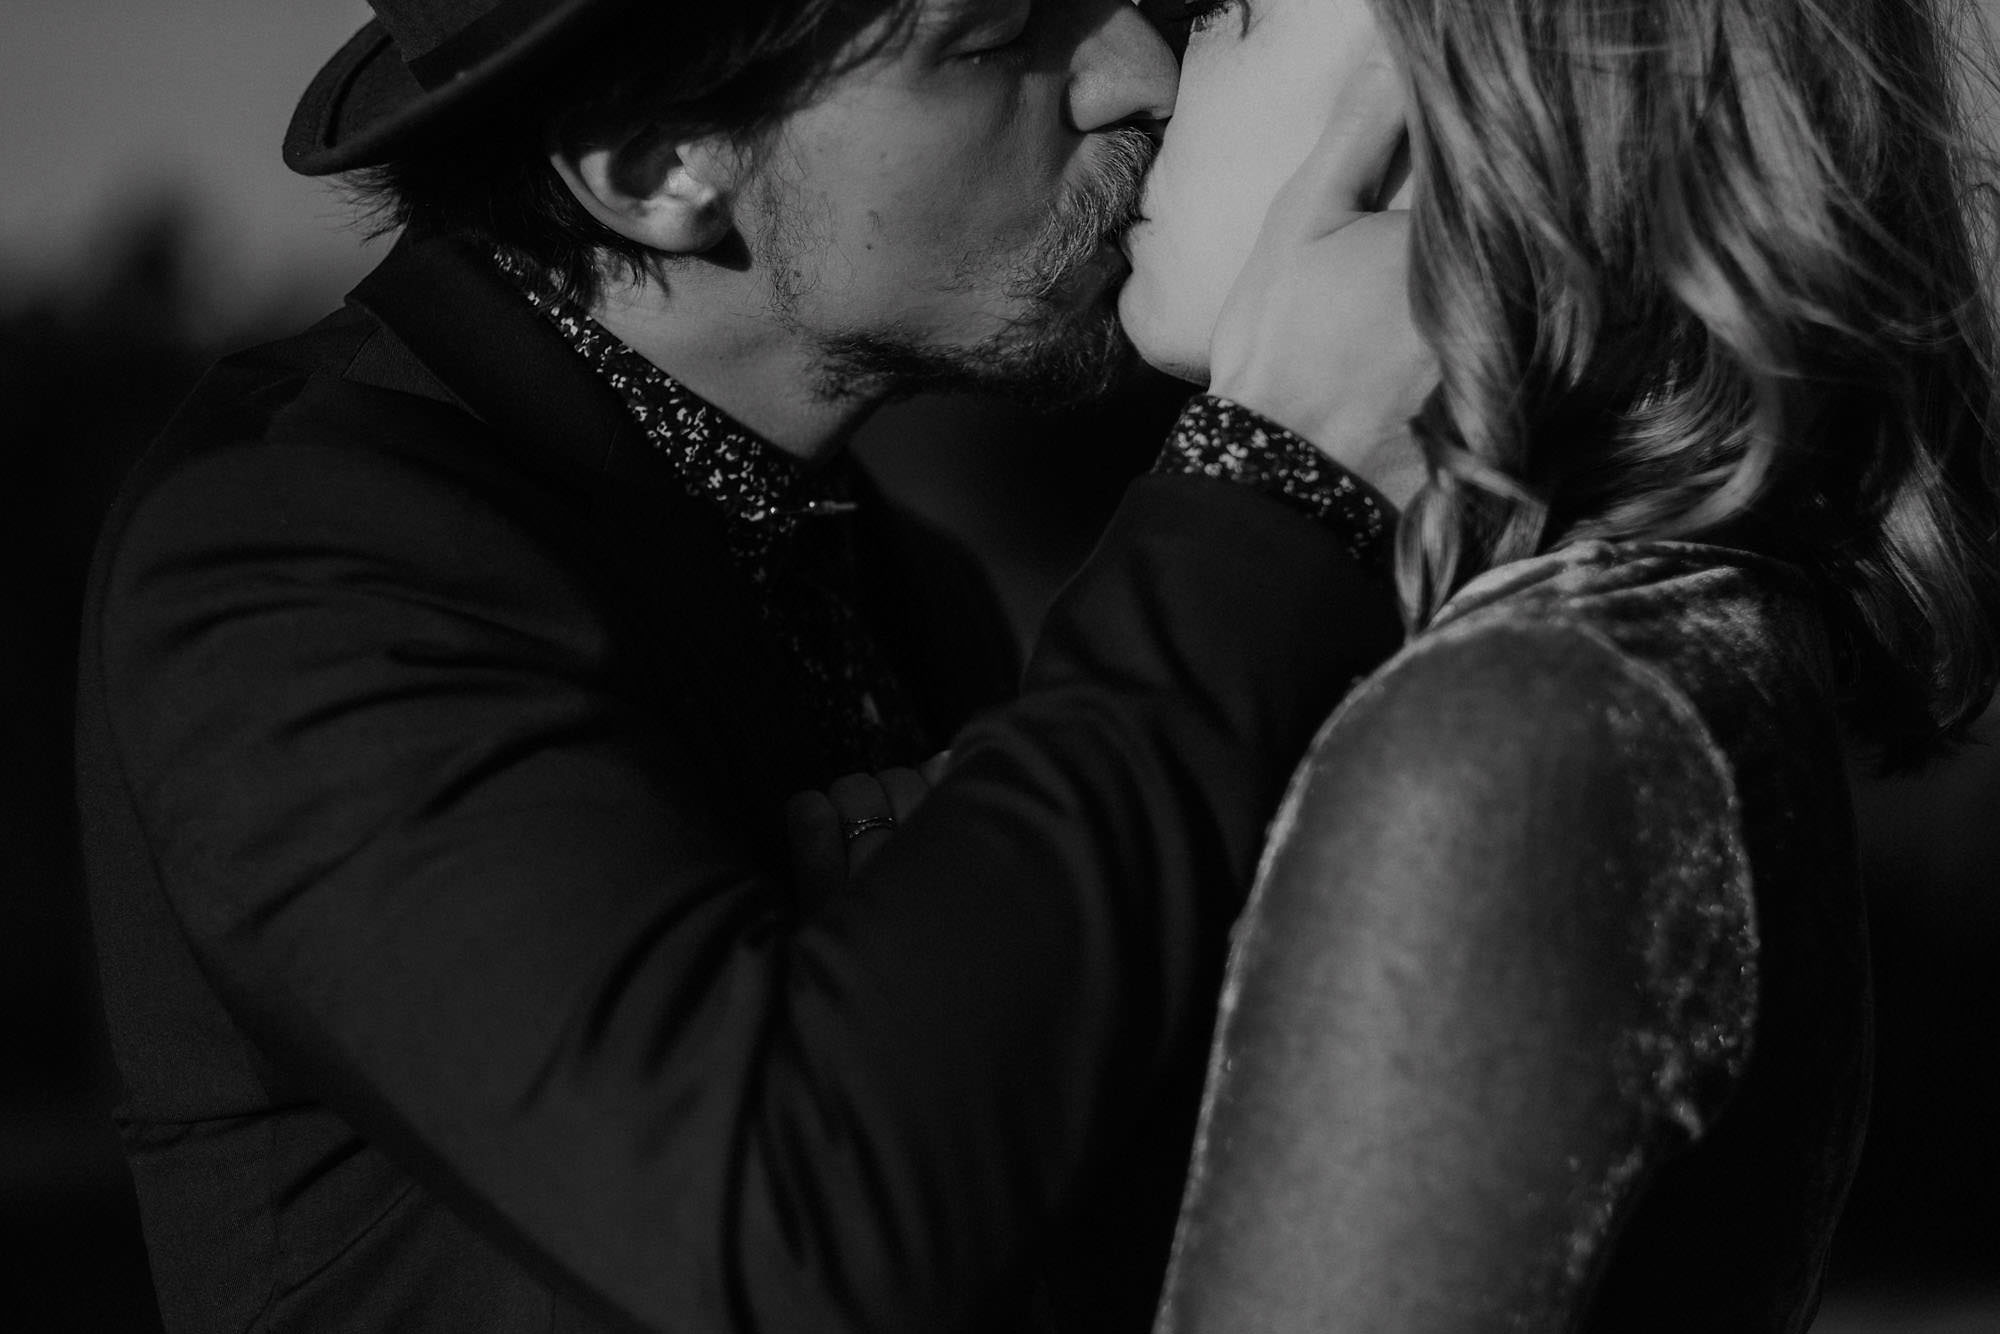 goult provence france elopement vow renewal couple kissing photo